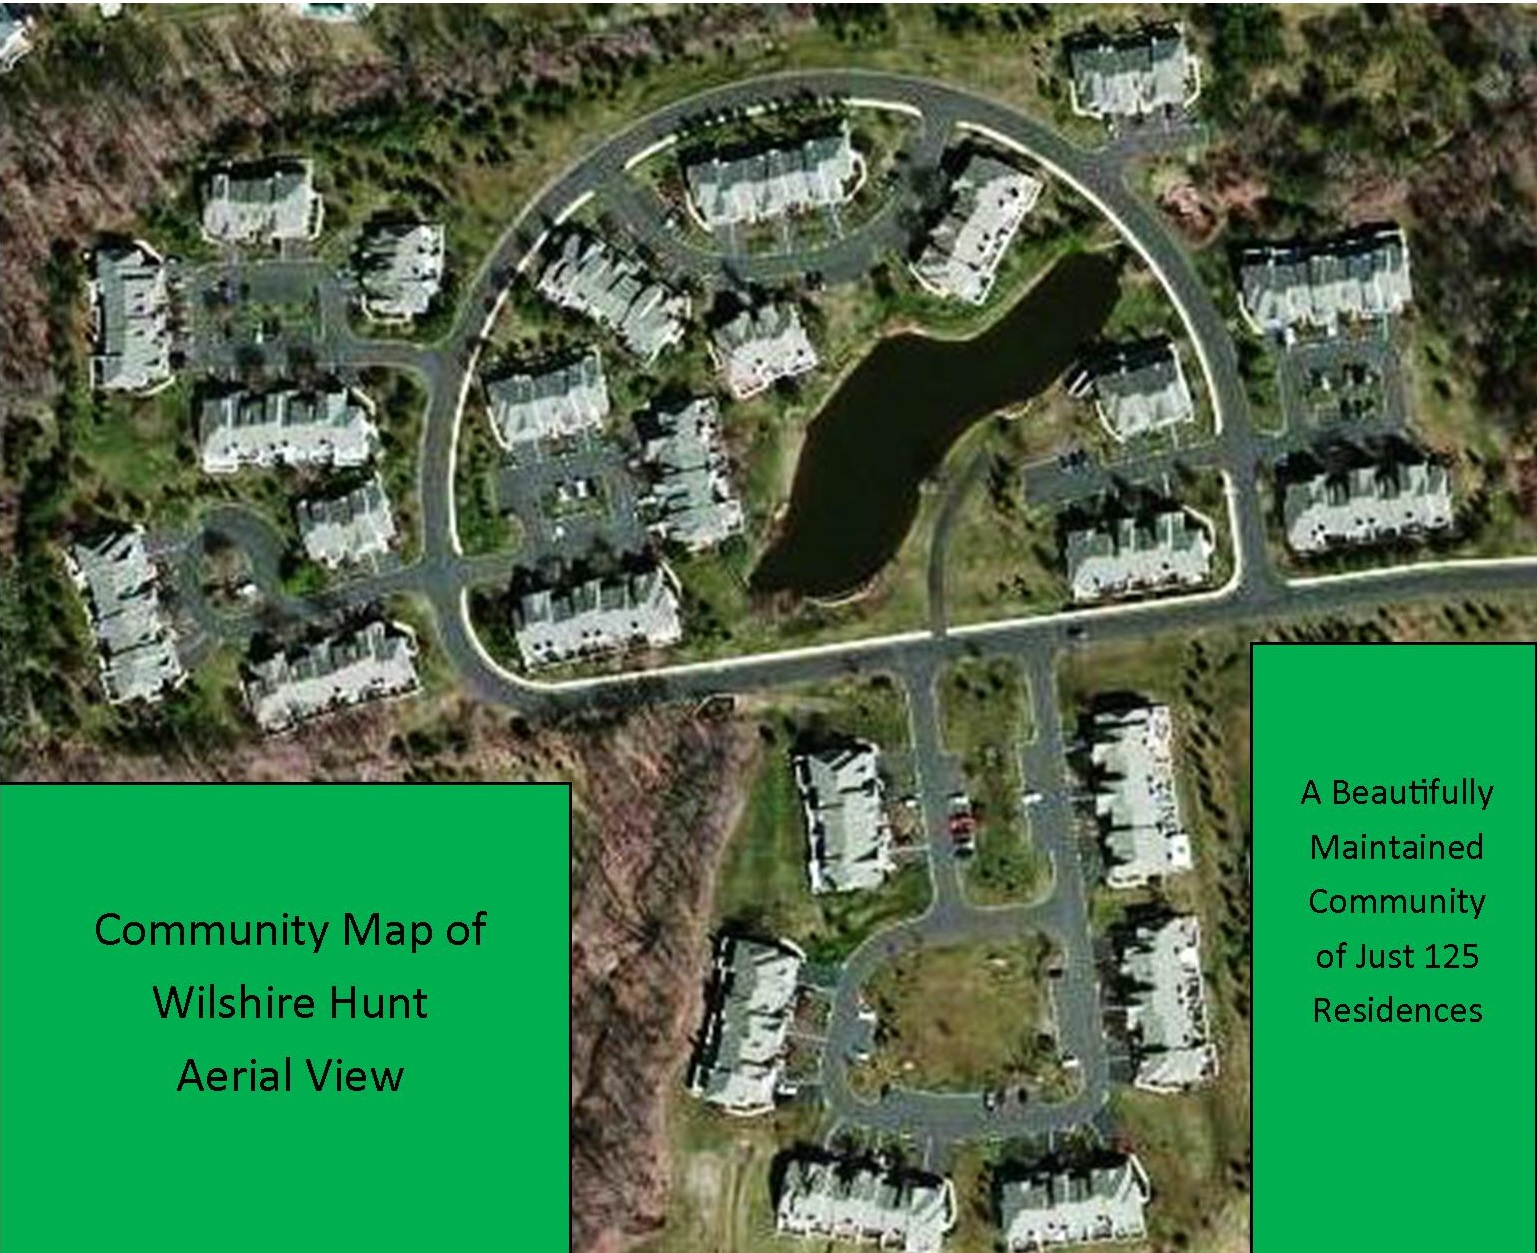 Wilshire Hunt - Community Map